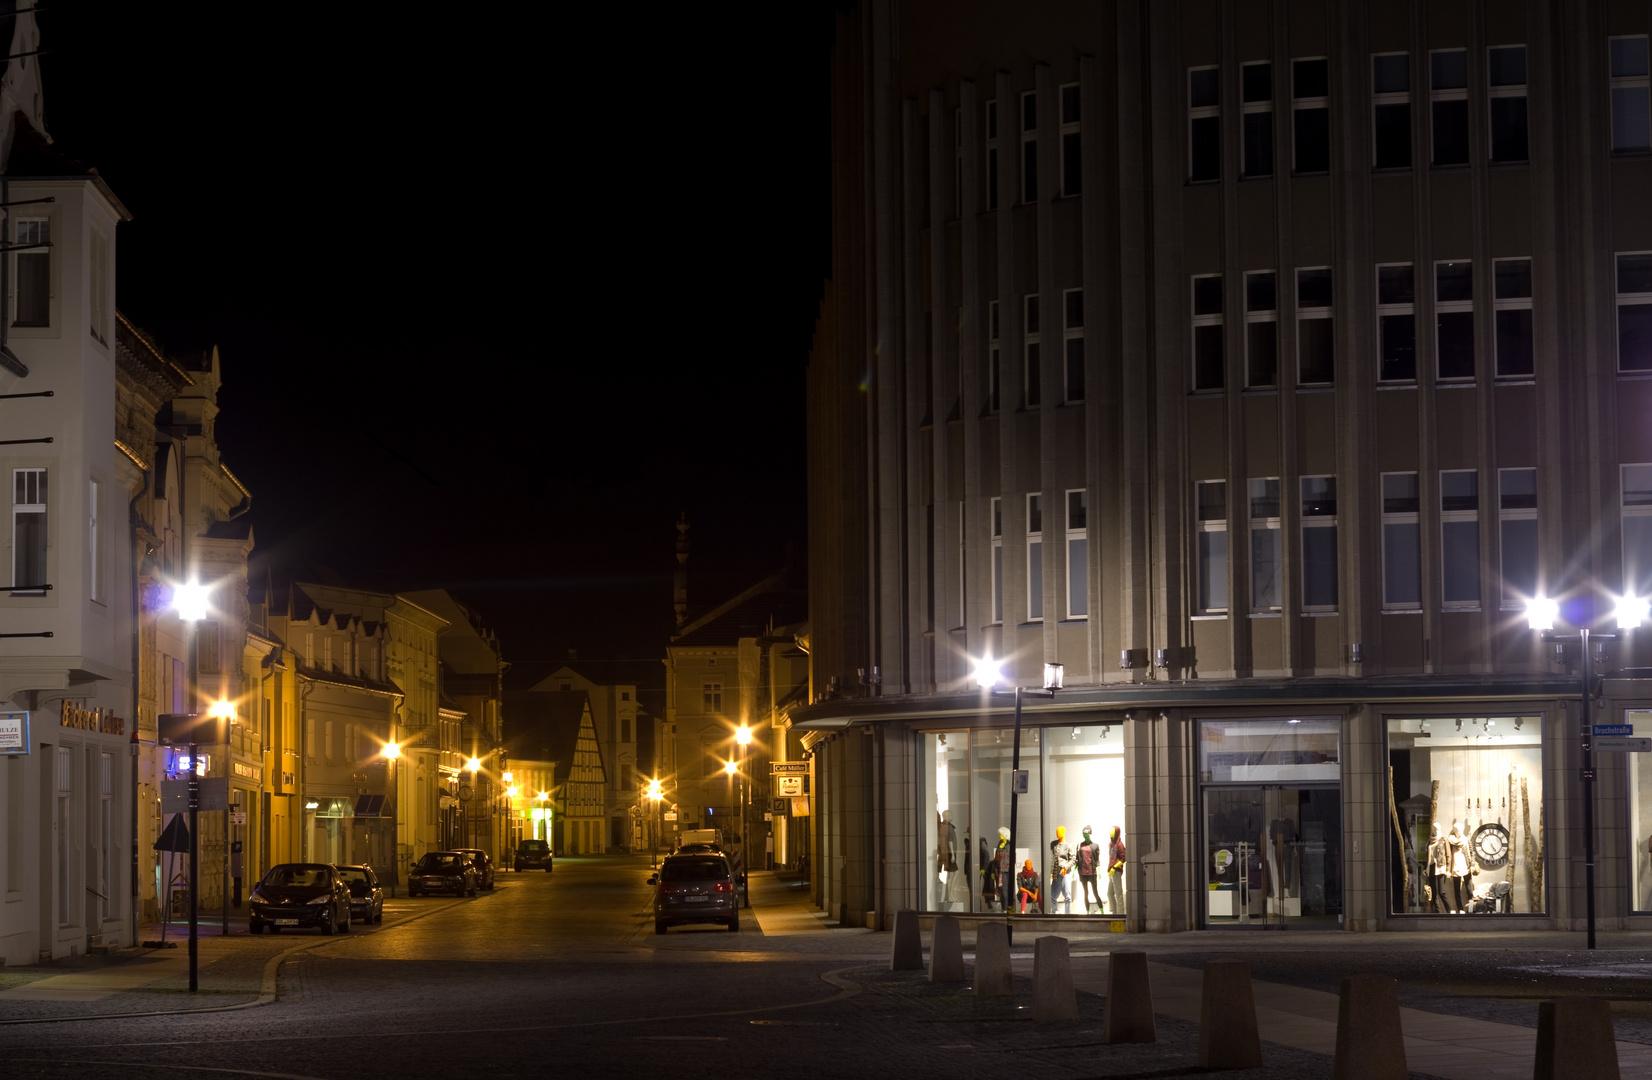 nachts in Stendal